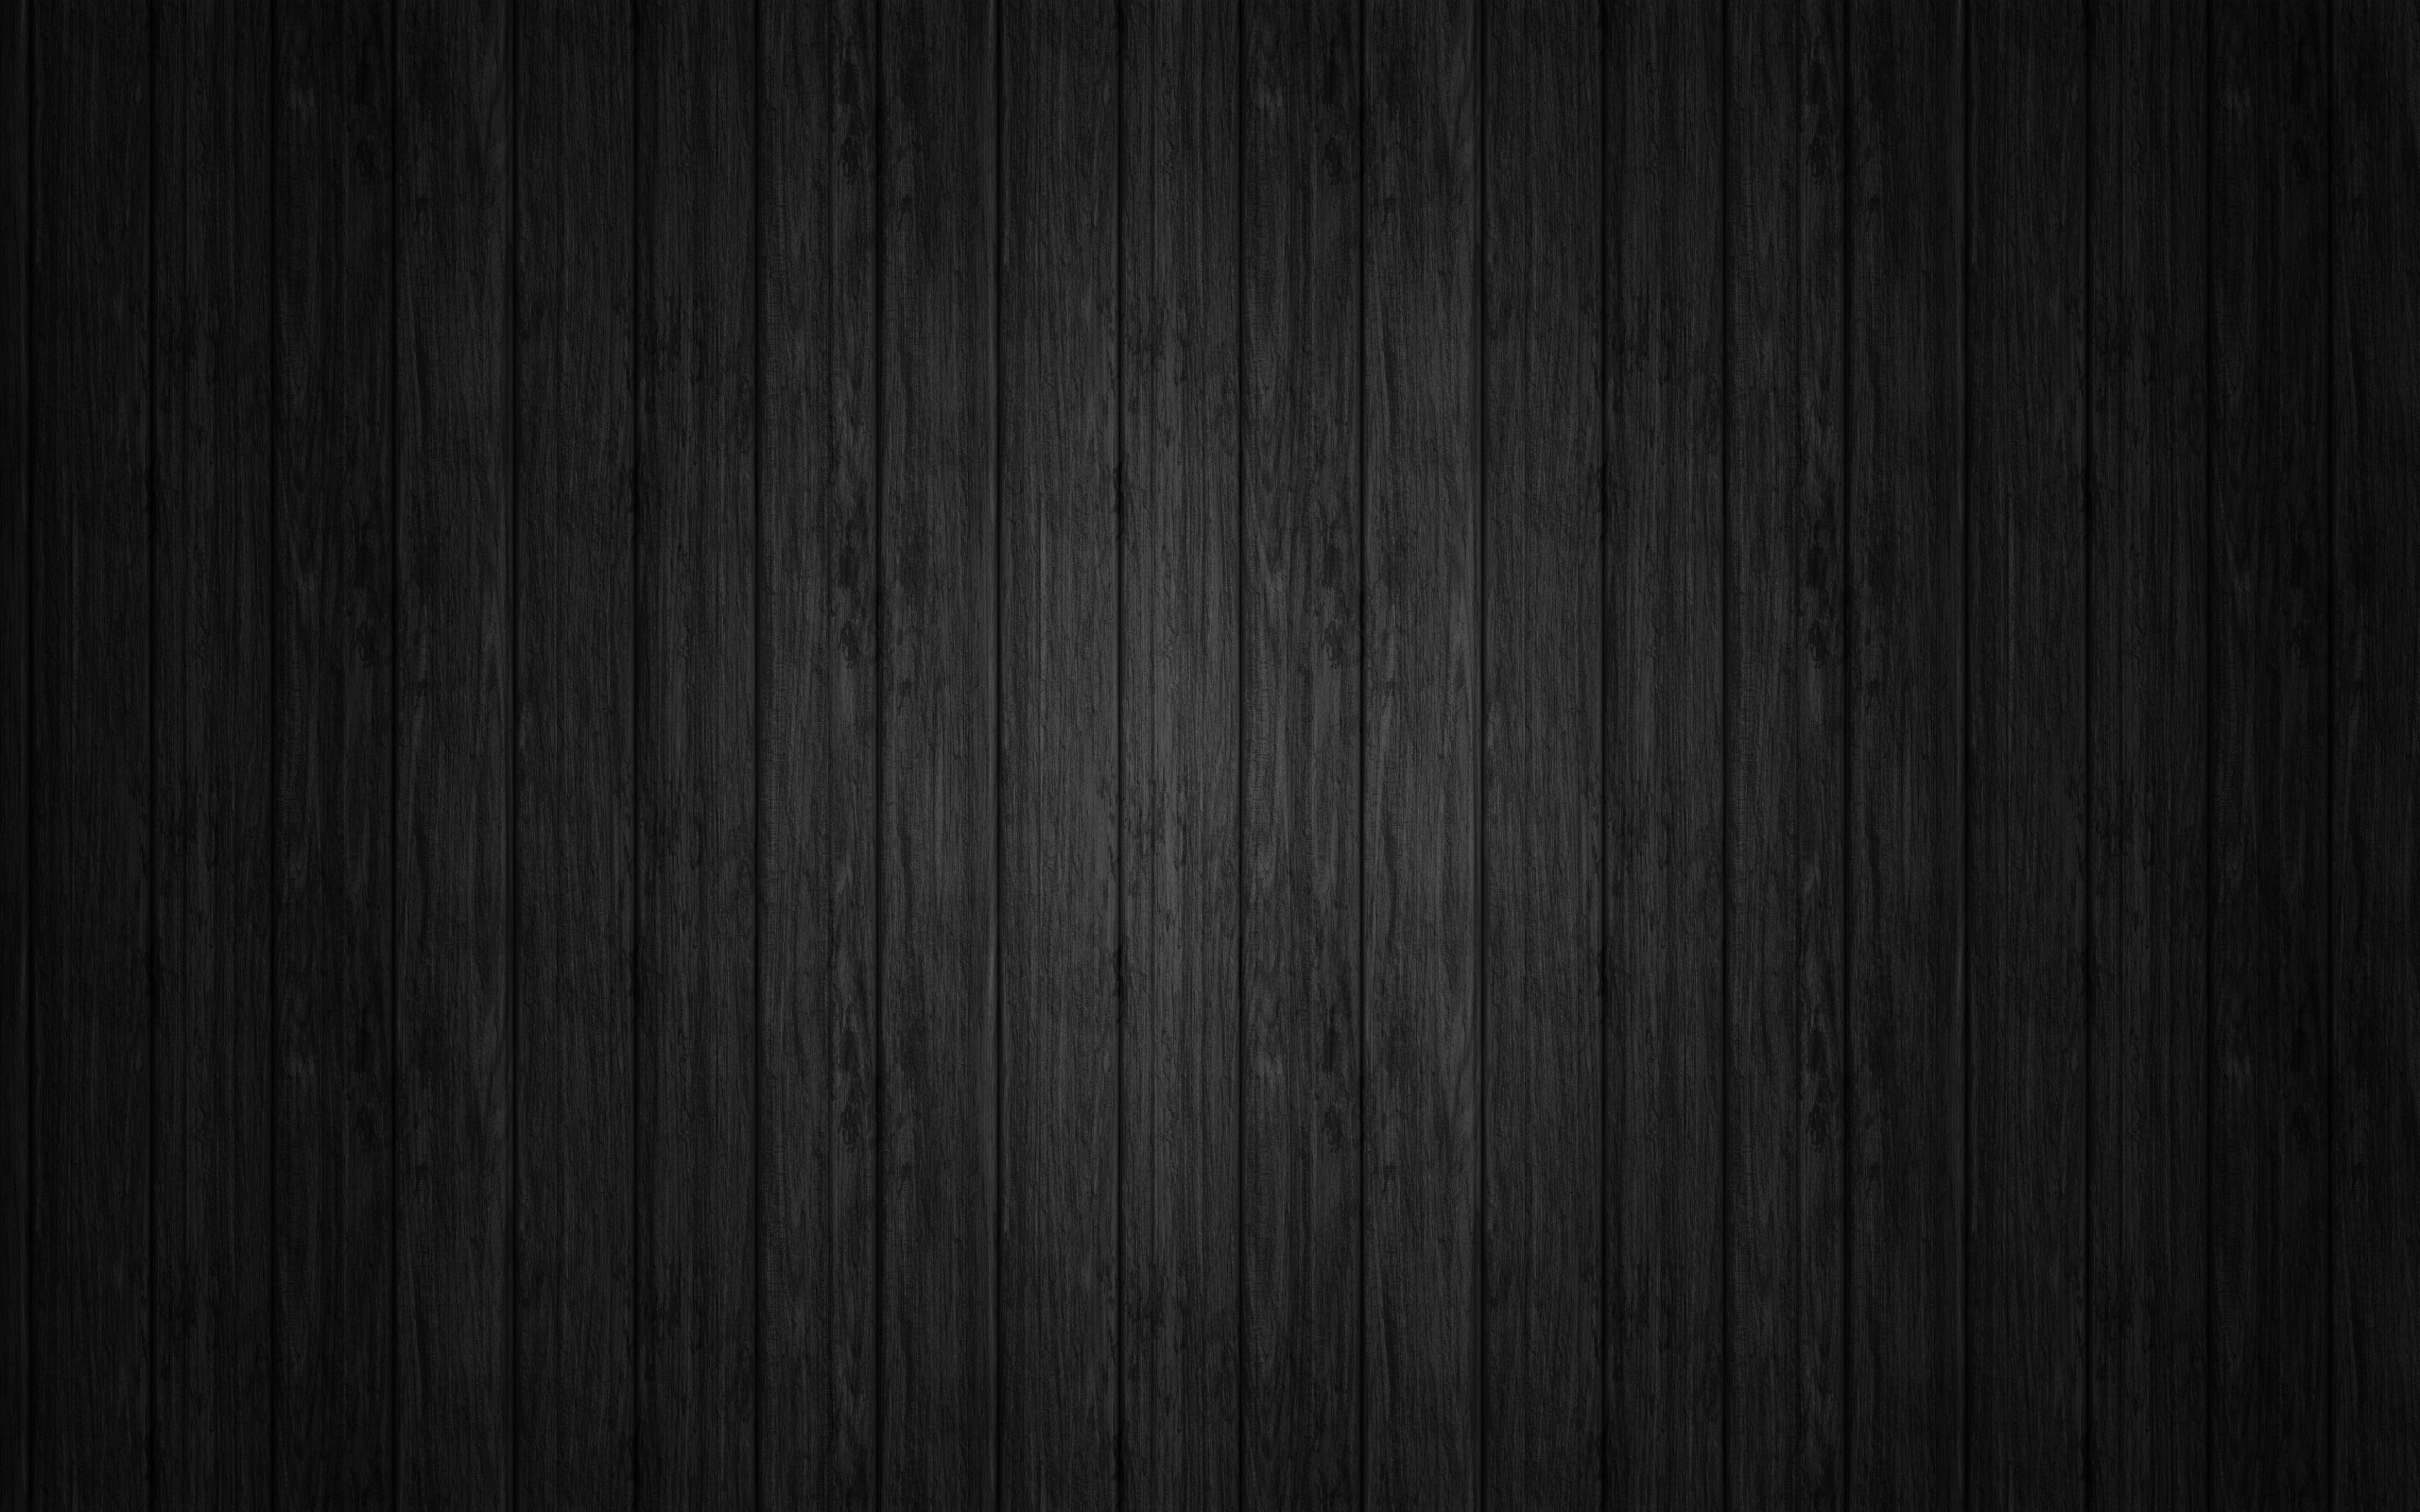 imvu wallpapers